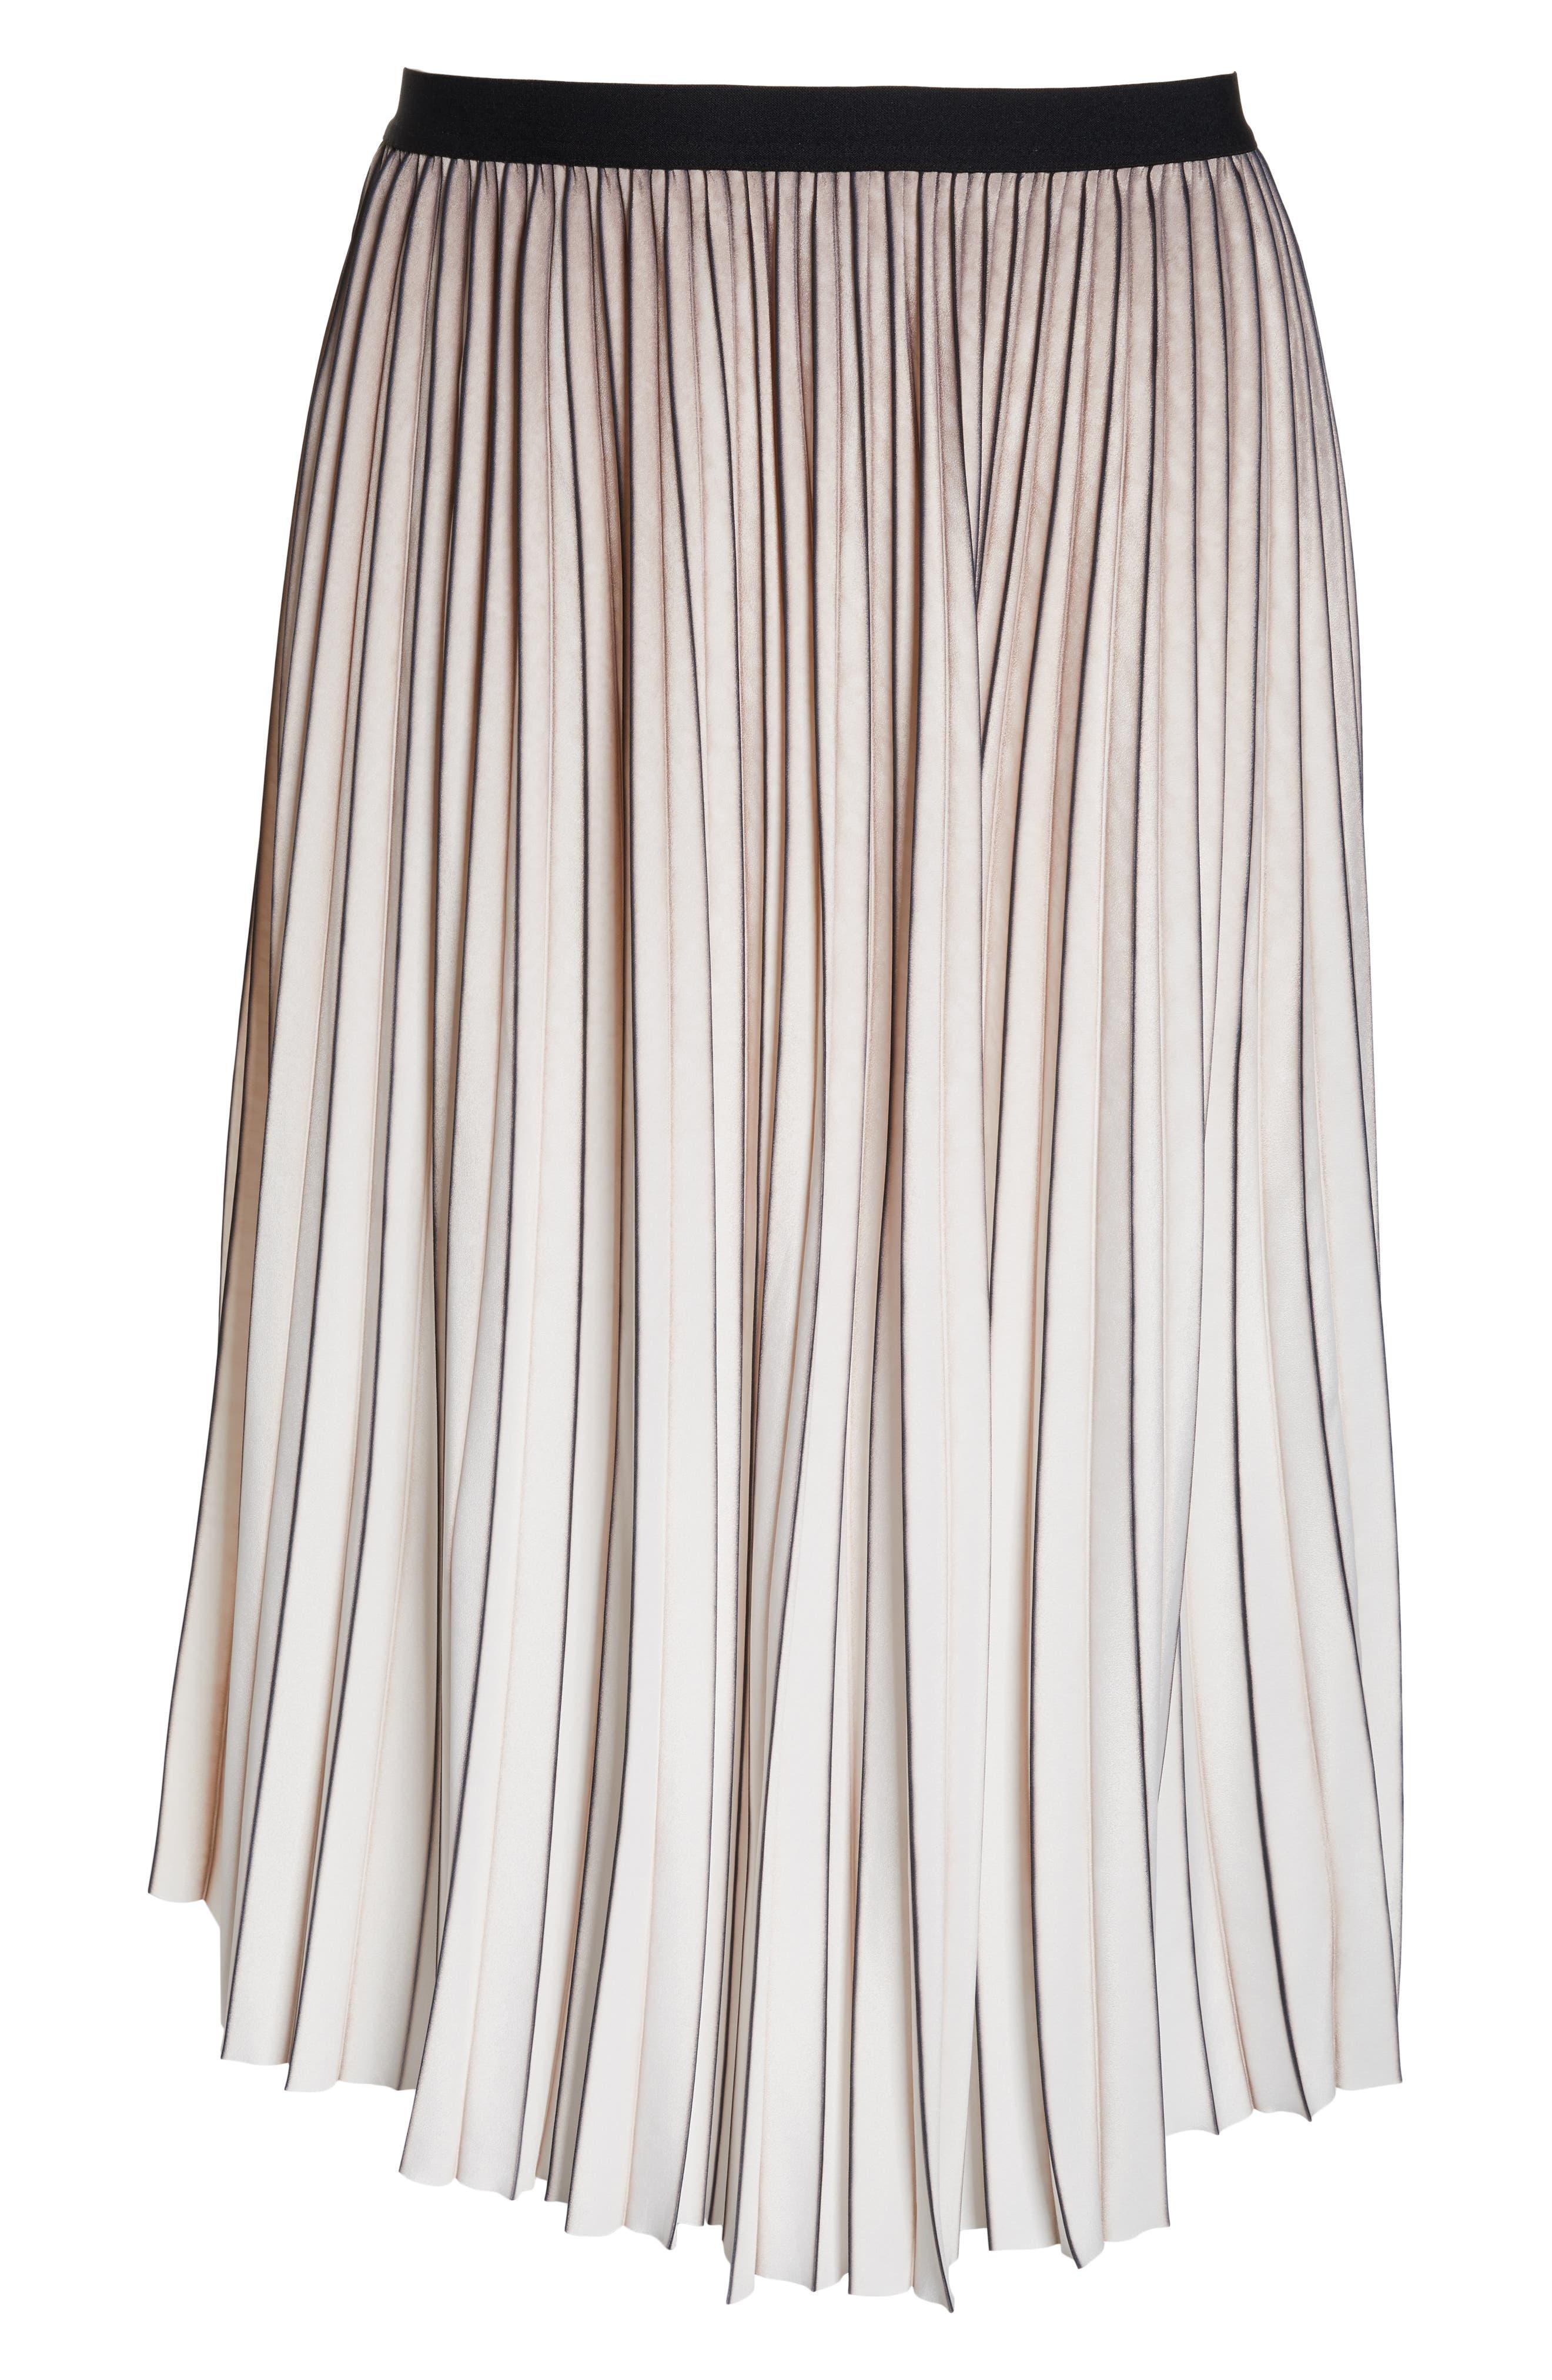 Stripe Pleat Skirt,                             Alternate thumbnail 6, color,                             MULTI